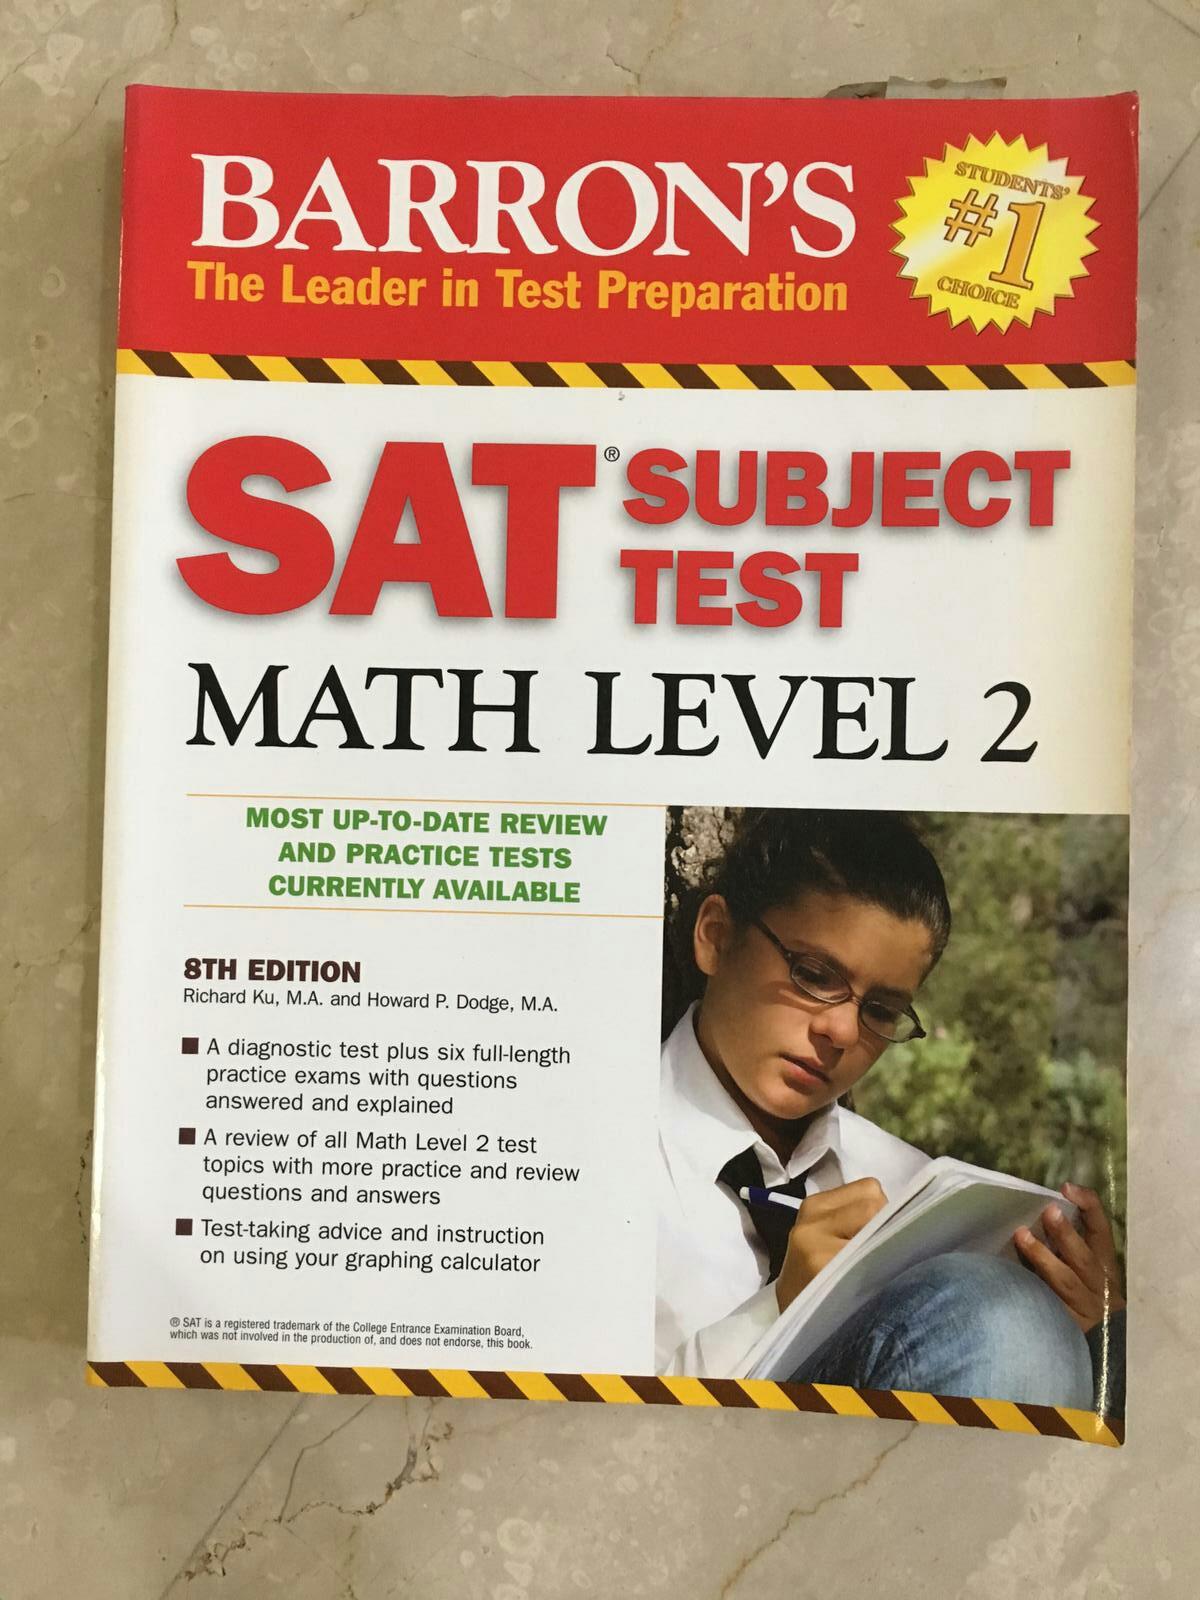 Barron's SAT Subject Test Math Level 2 Textbook